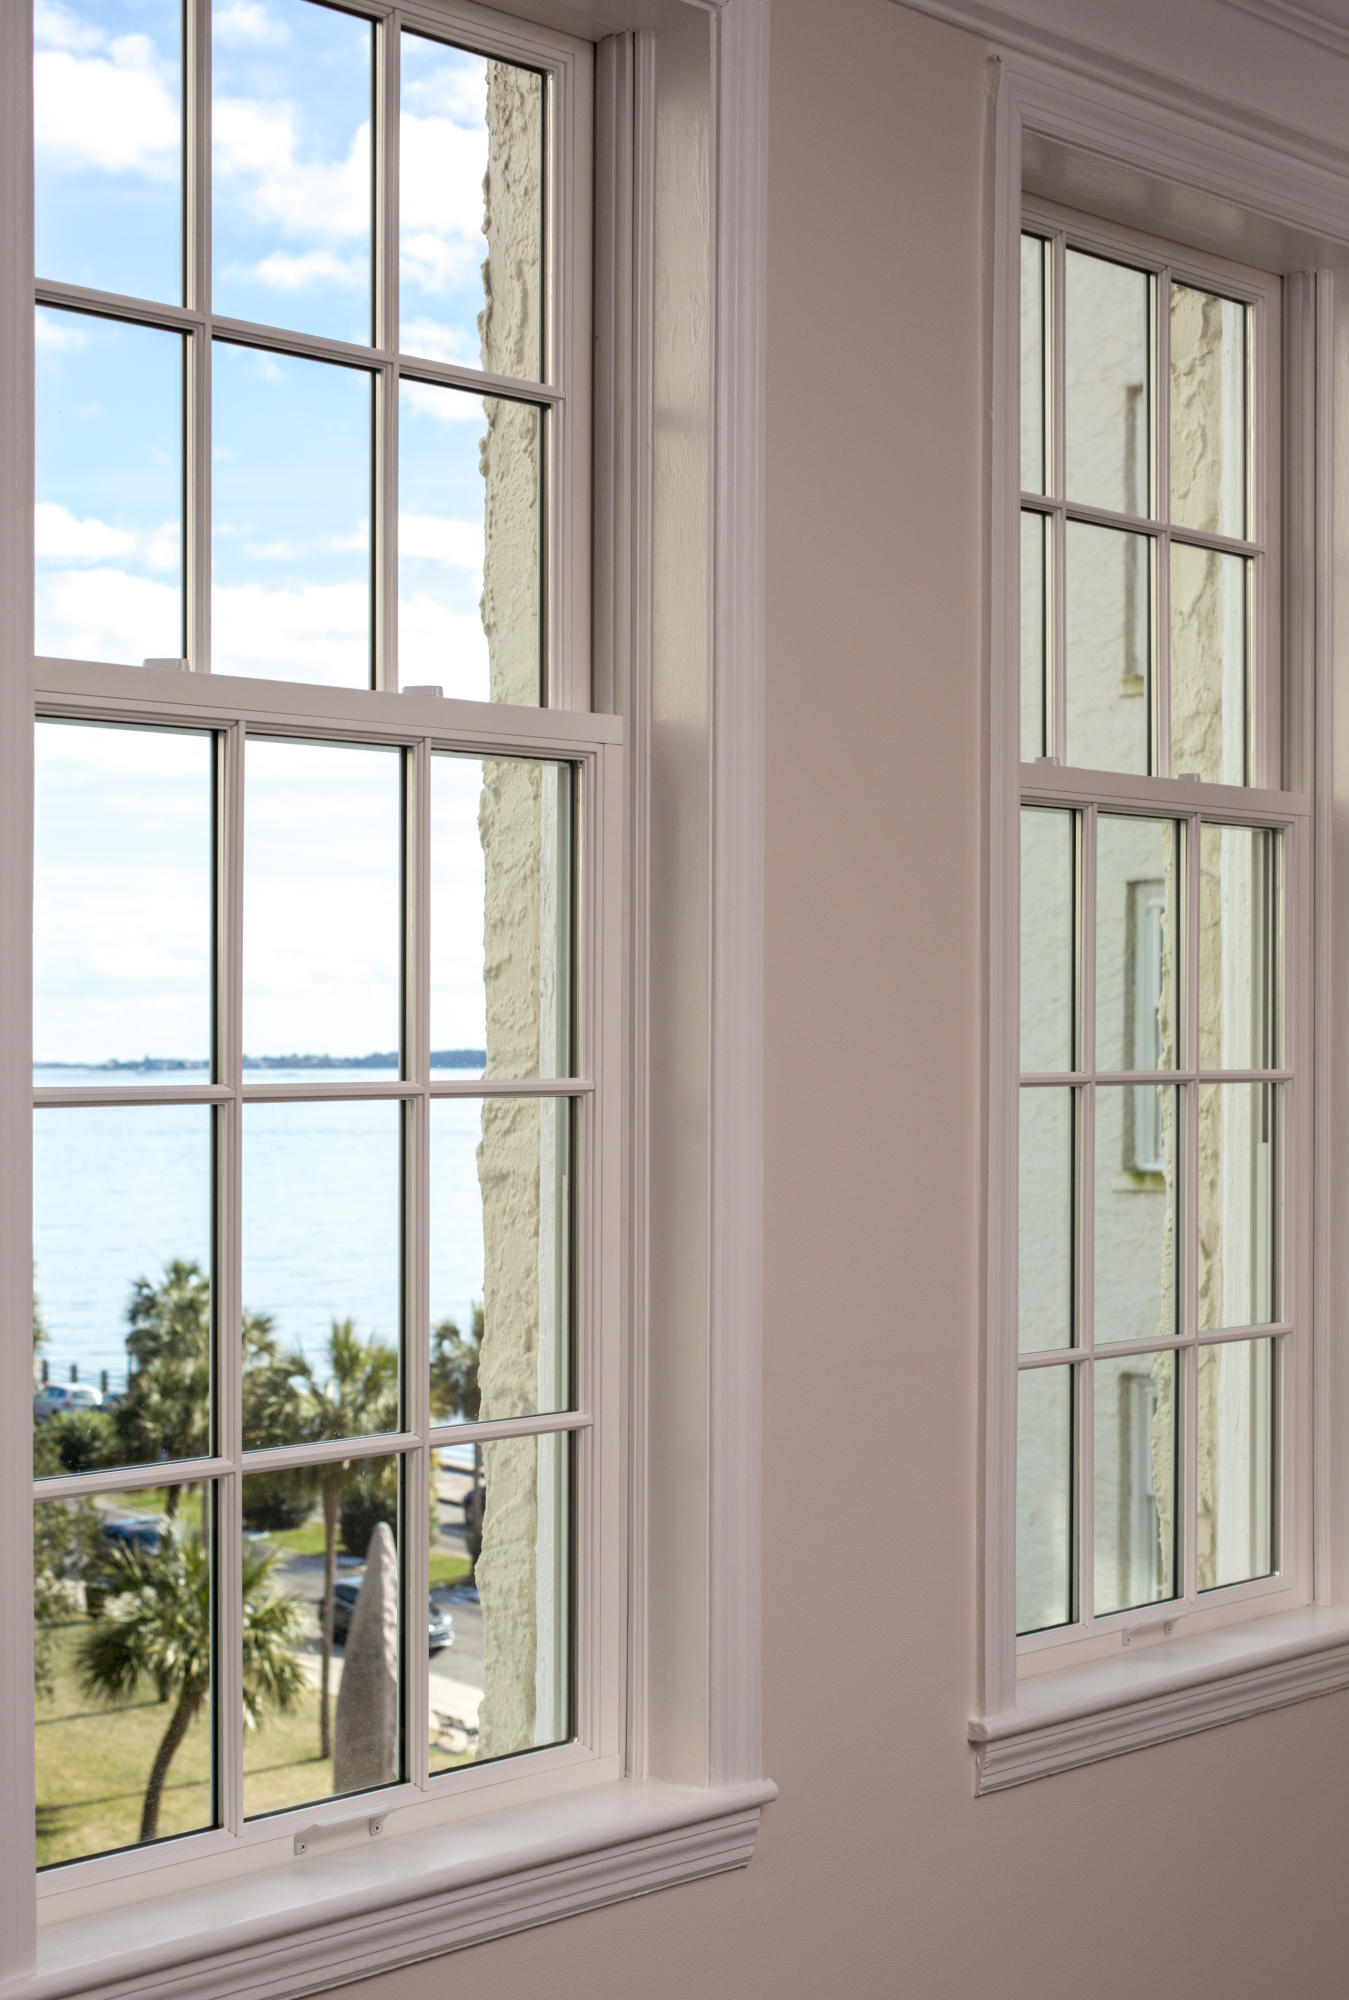 Fort Sumter House Homes For Sale - 1 King, Charleston, SC - 20